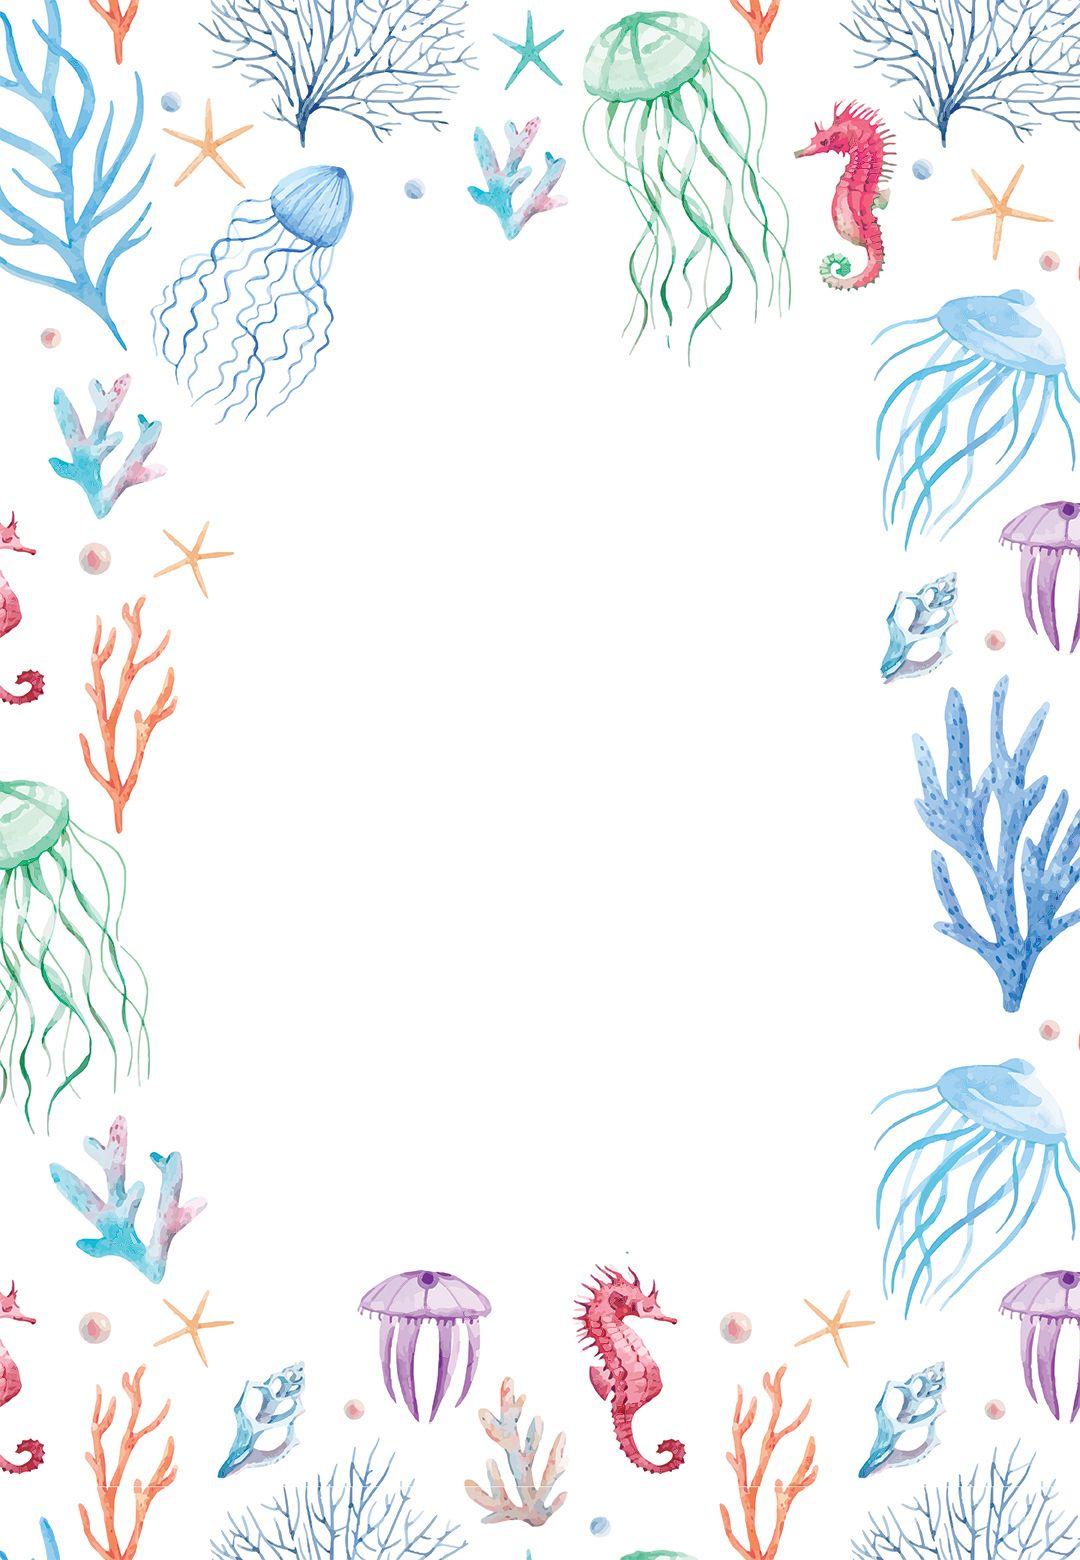 under the sea baby shower invitation template free. Black Bedroom Furniture Sets. Home Design Ideas